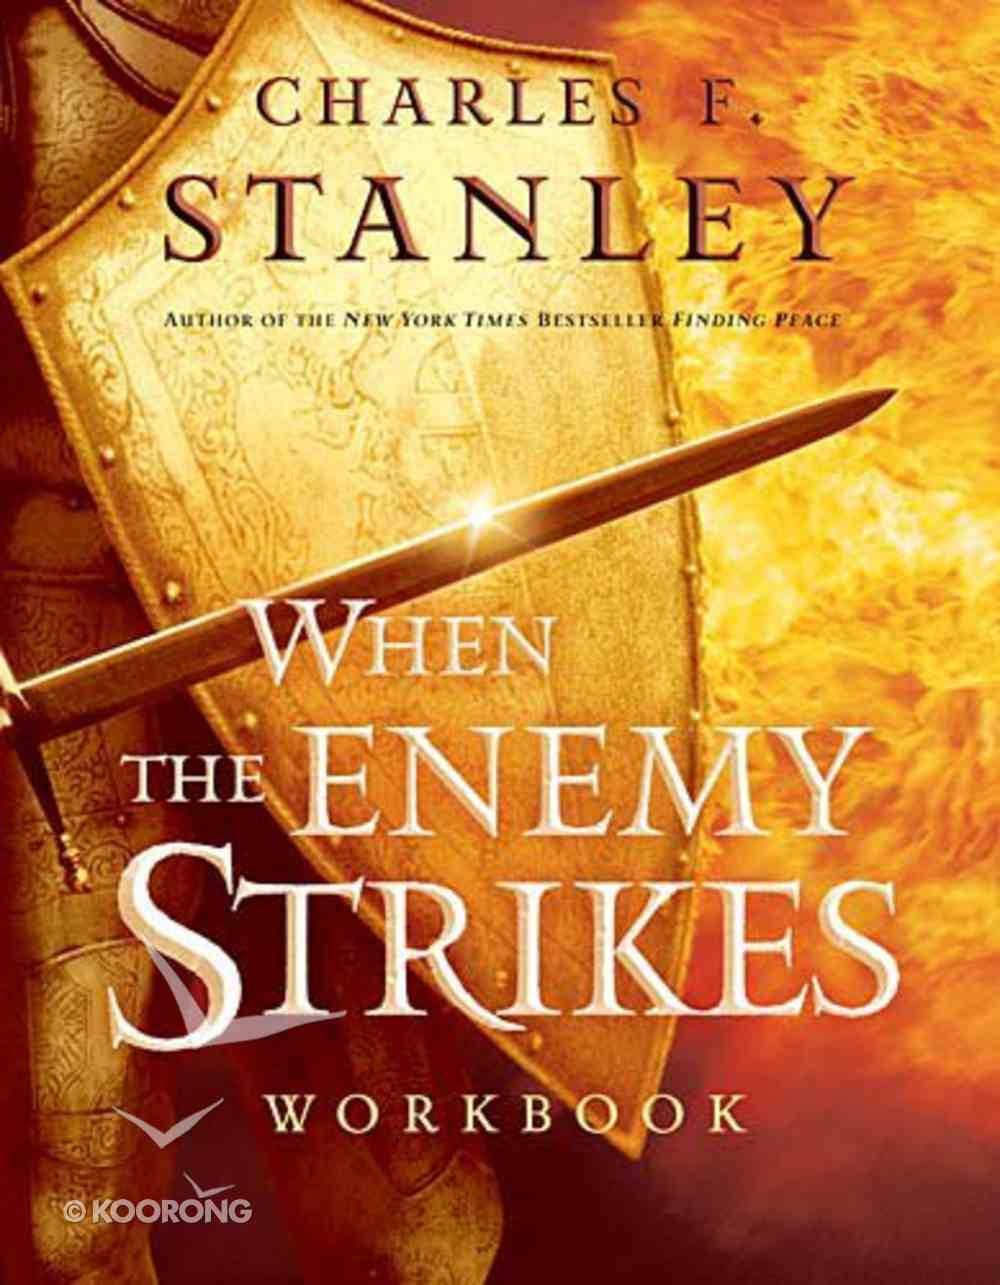 When the Enemy Strikes Workbook Paperback